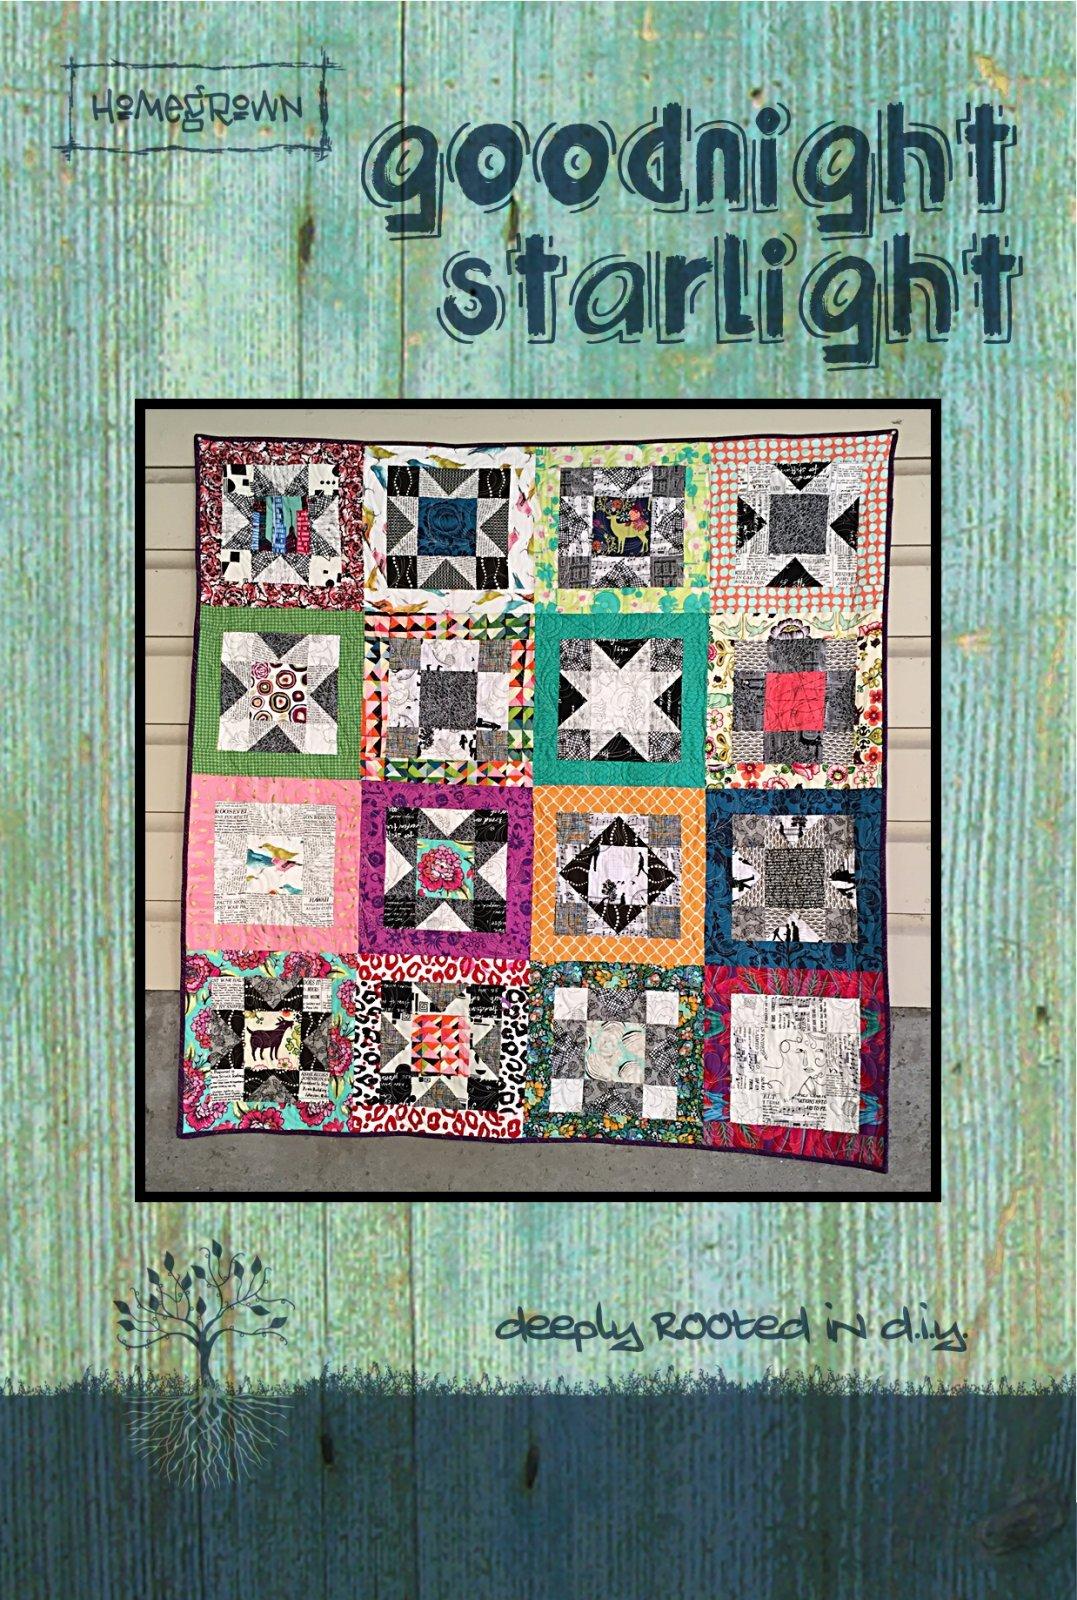 Postcard Pattern - Goodnight Starlight